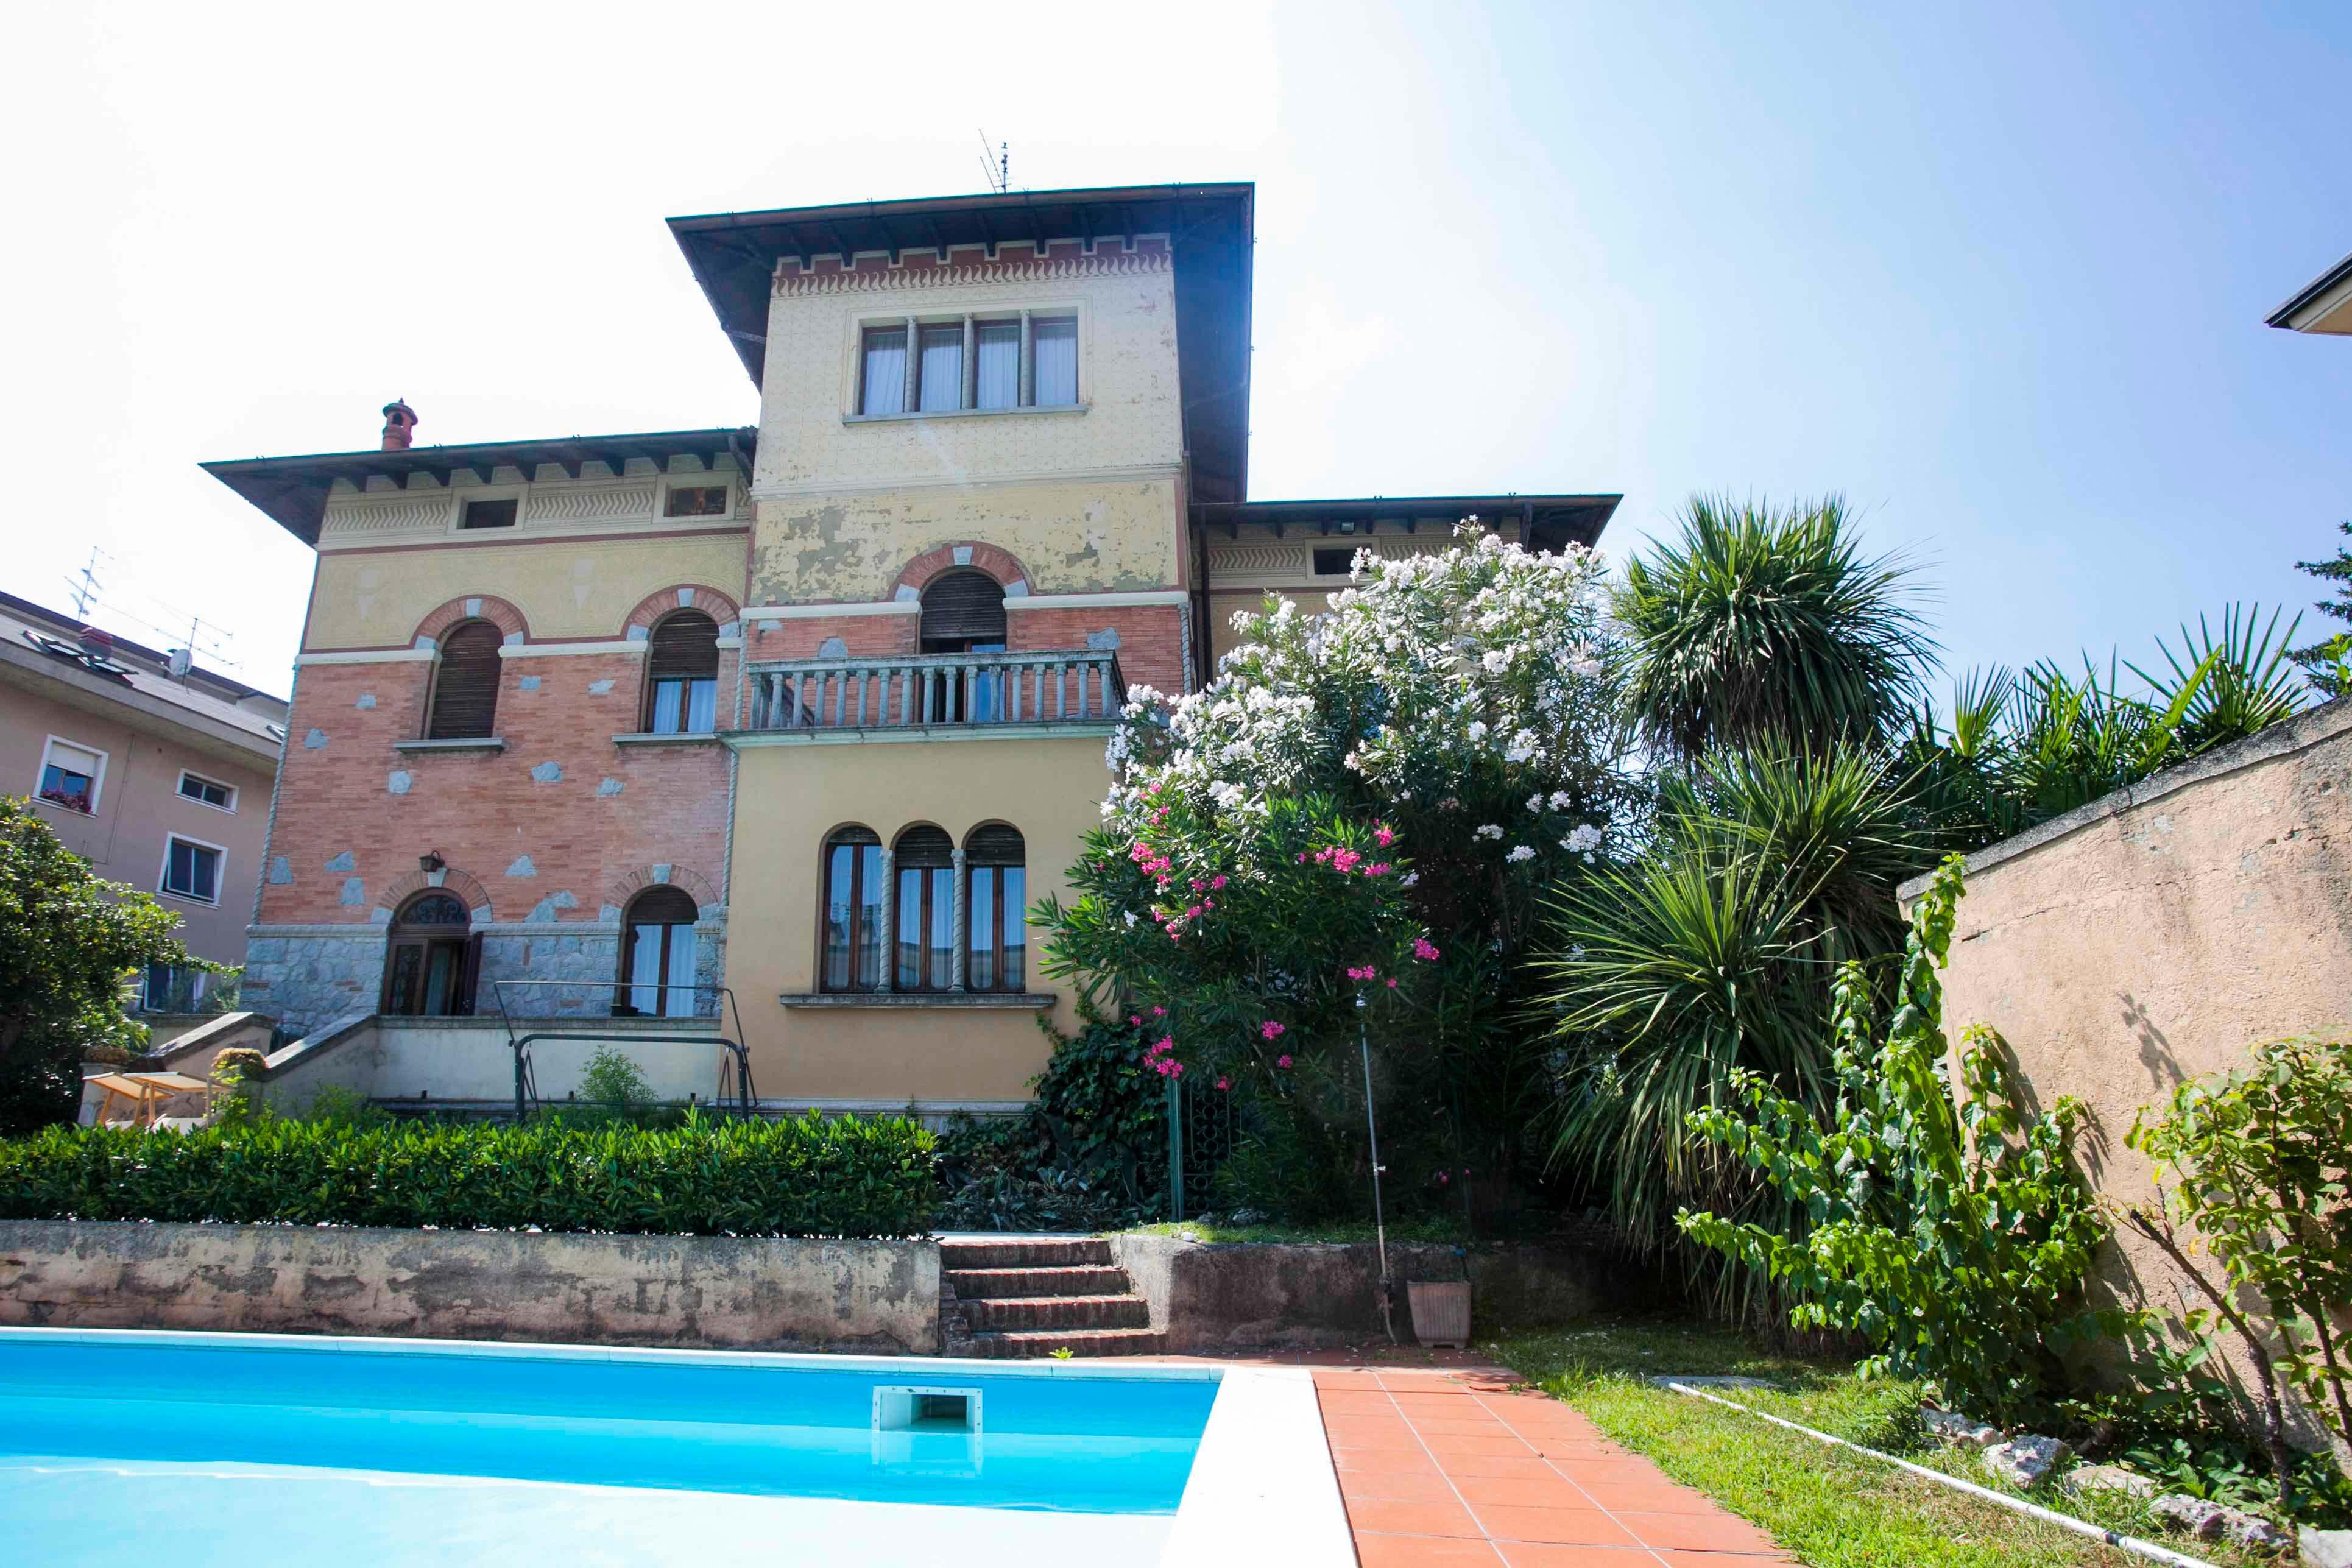 Vakantiehuis Italian Residence lago-Bara Gardameer